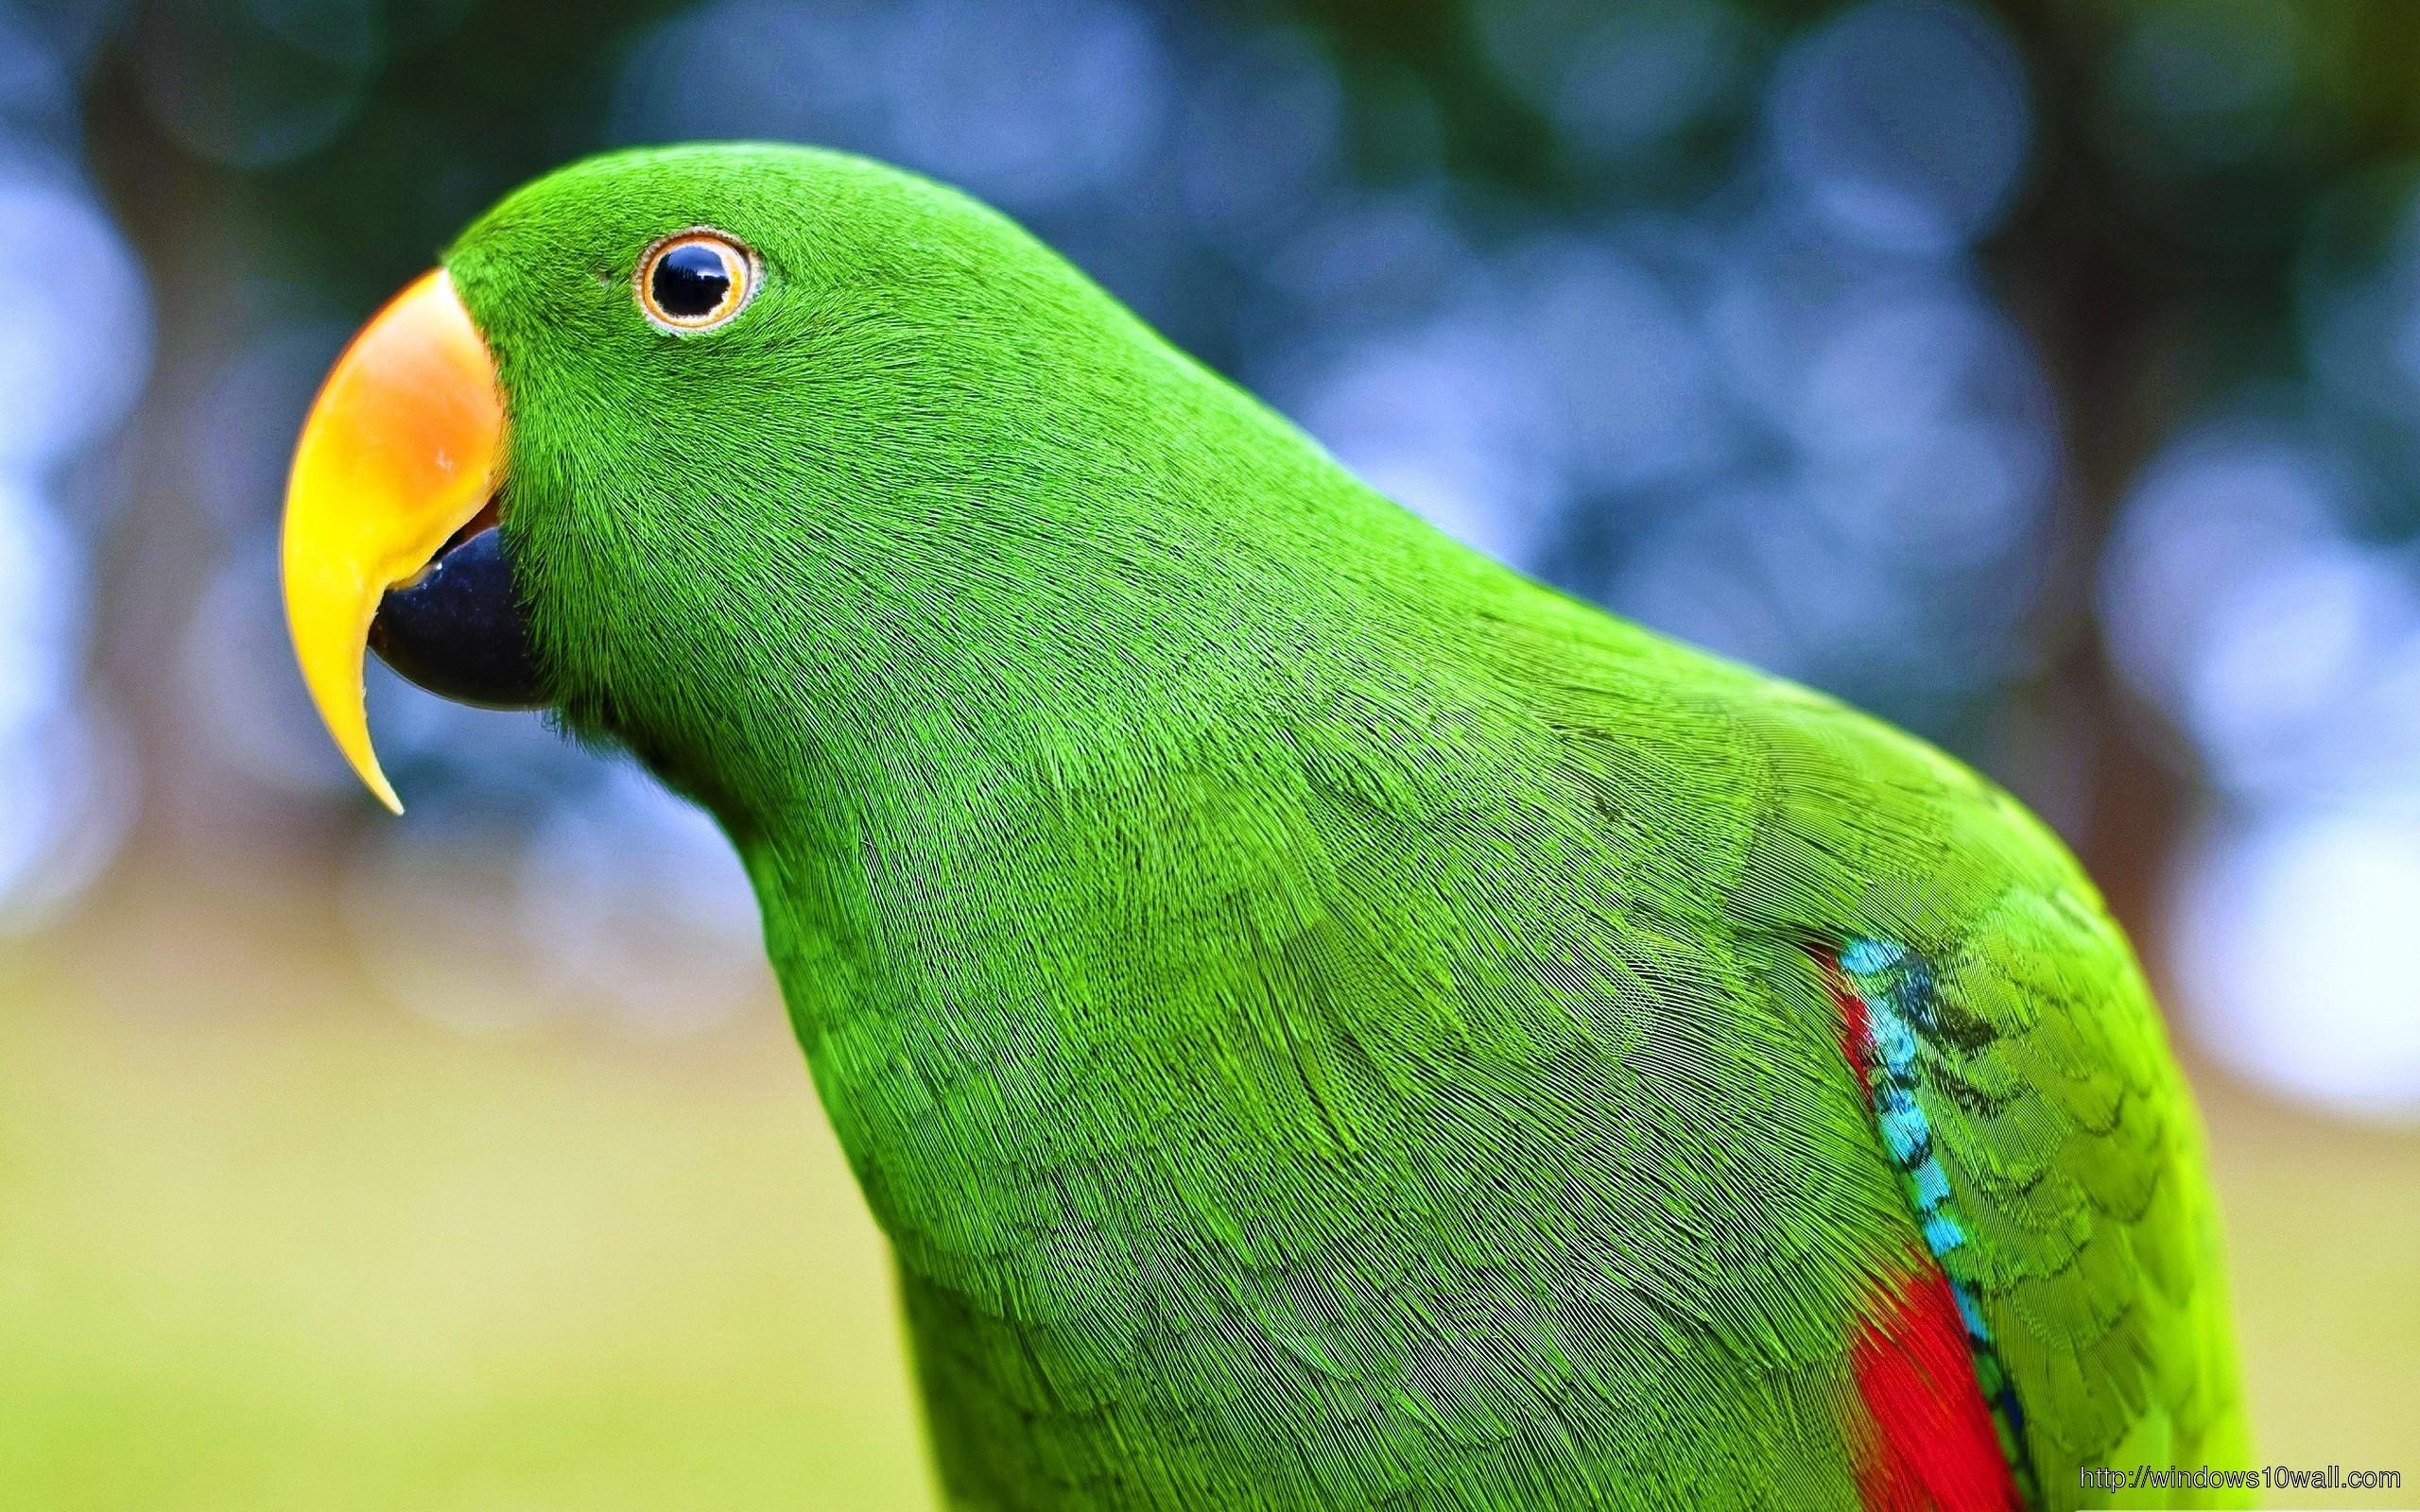 birds-parrots-green-wallpaper